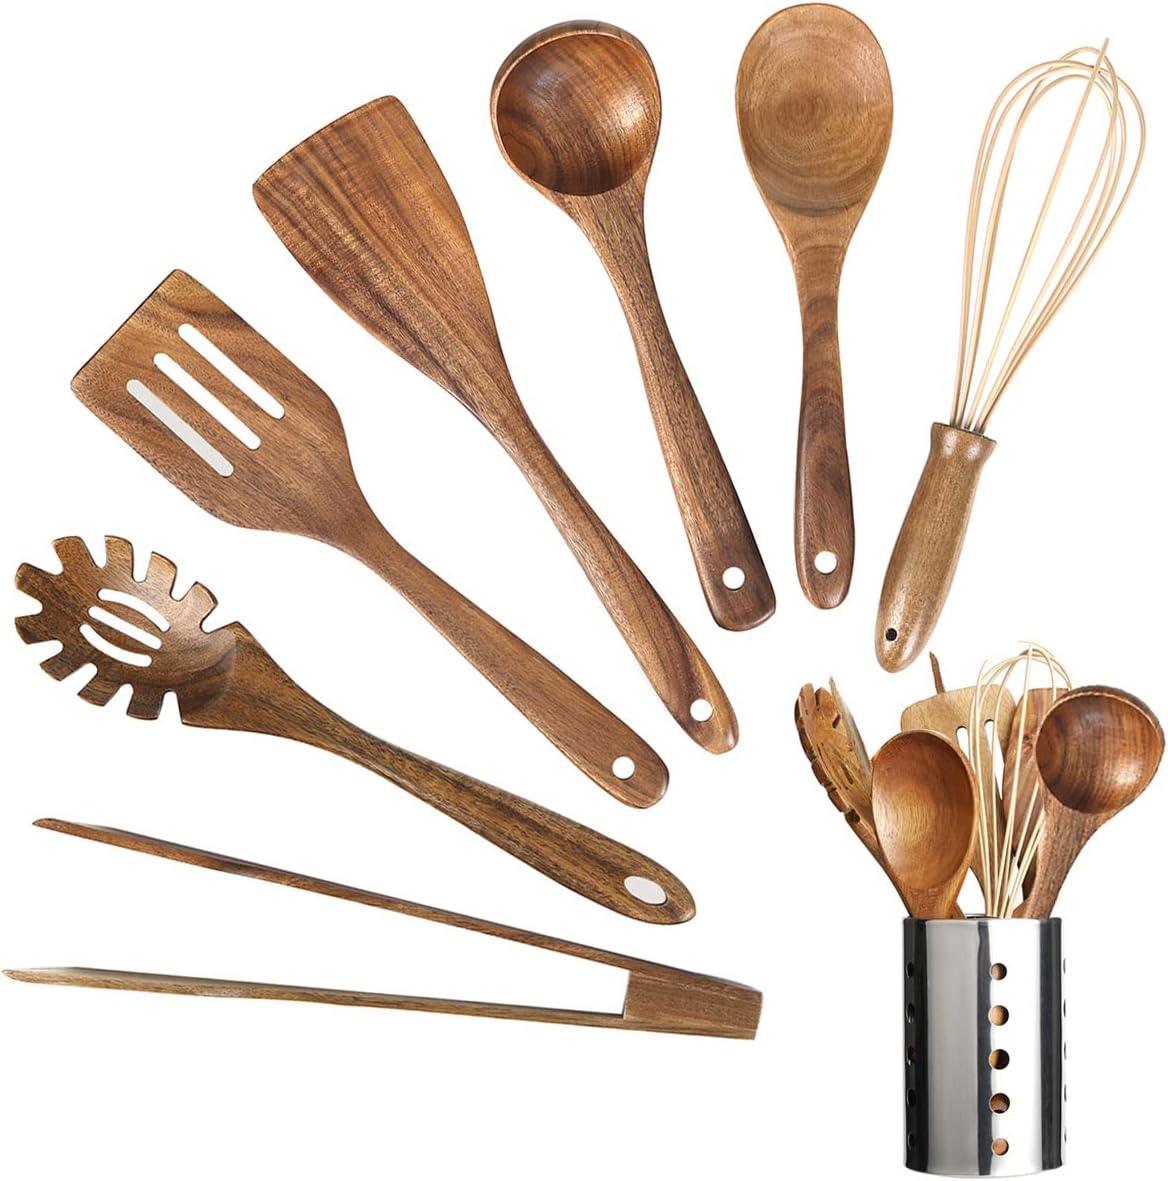 handmade wood spoon Set of spoons spoon handcrafted in pear wood . wooden spoon kitchen utensil wooden spoons